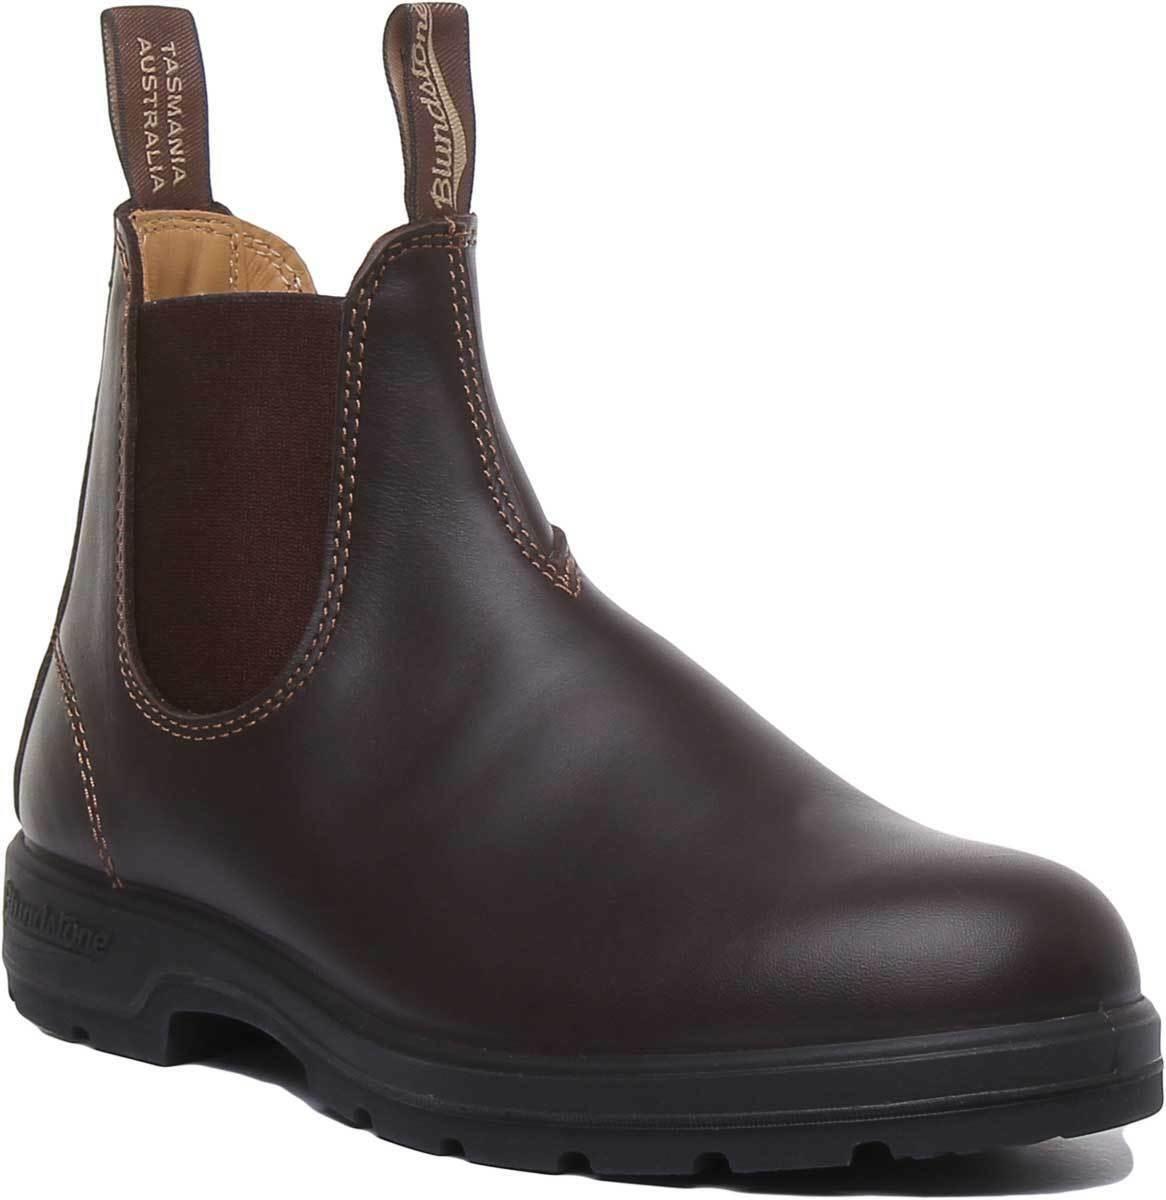 Blaundstone 550 Unisex Leather Matt Chelsea Stiefel in Brau EU Large 35 - 41